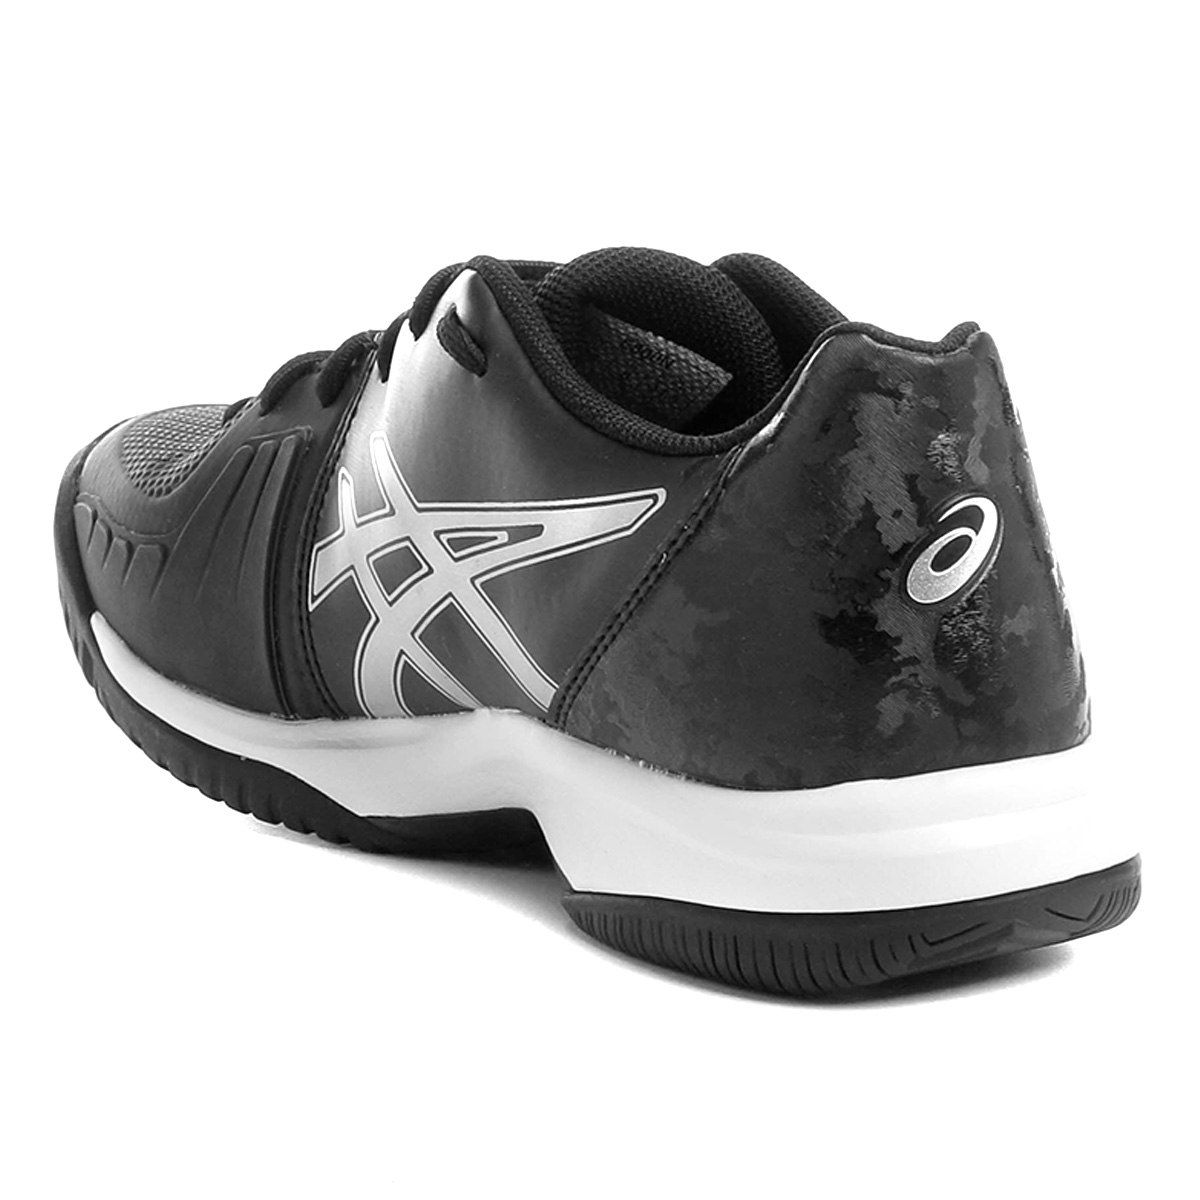 Tênis Asics Gel Court Speed - Preto e Branco